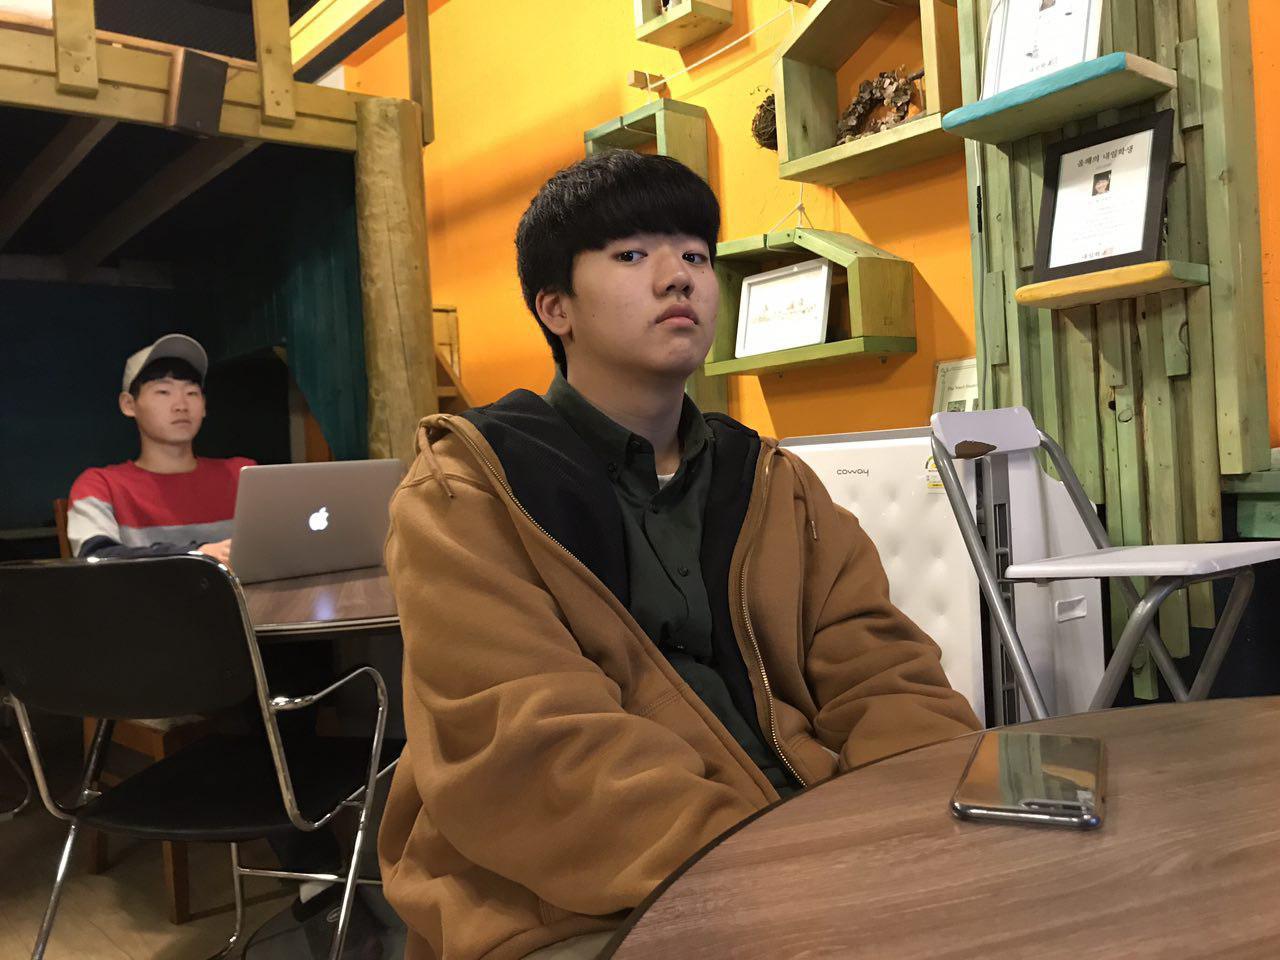 photo_2017-12-22_17-43-20.jpg